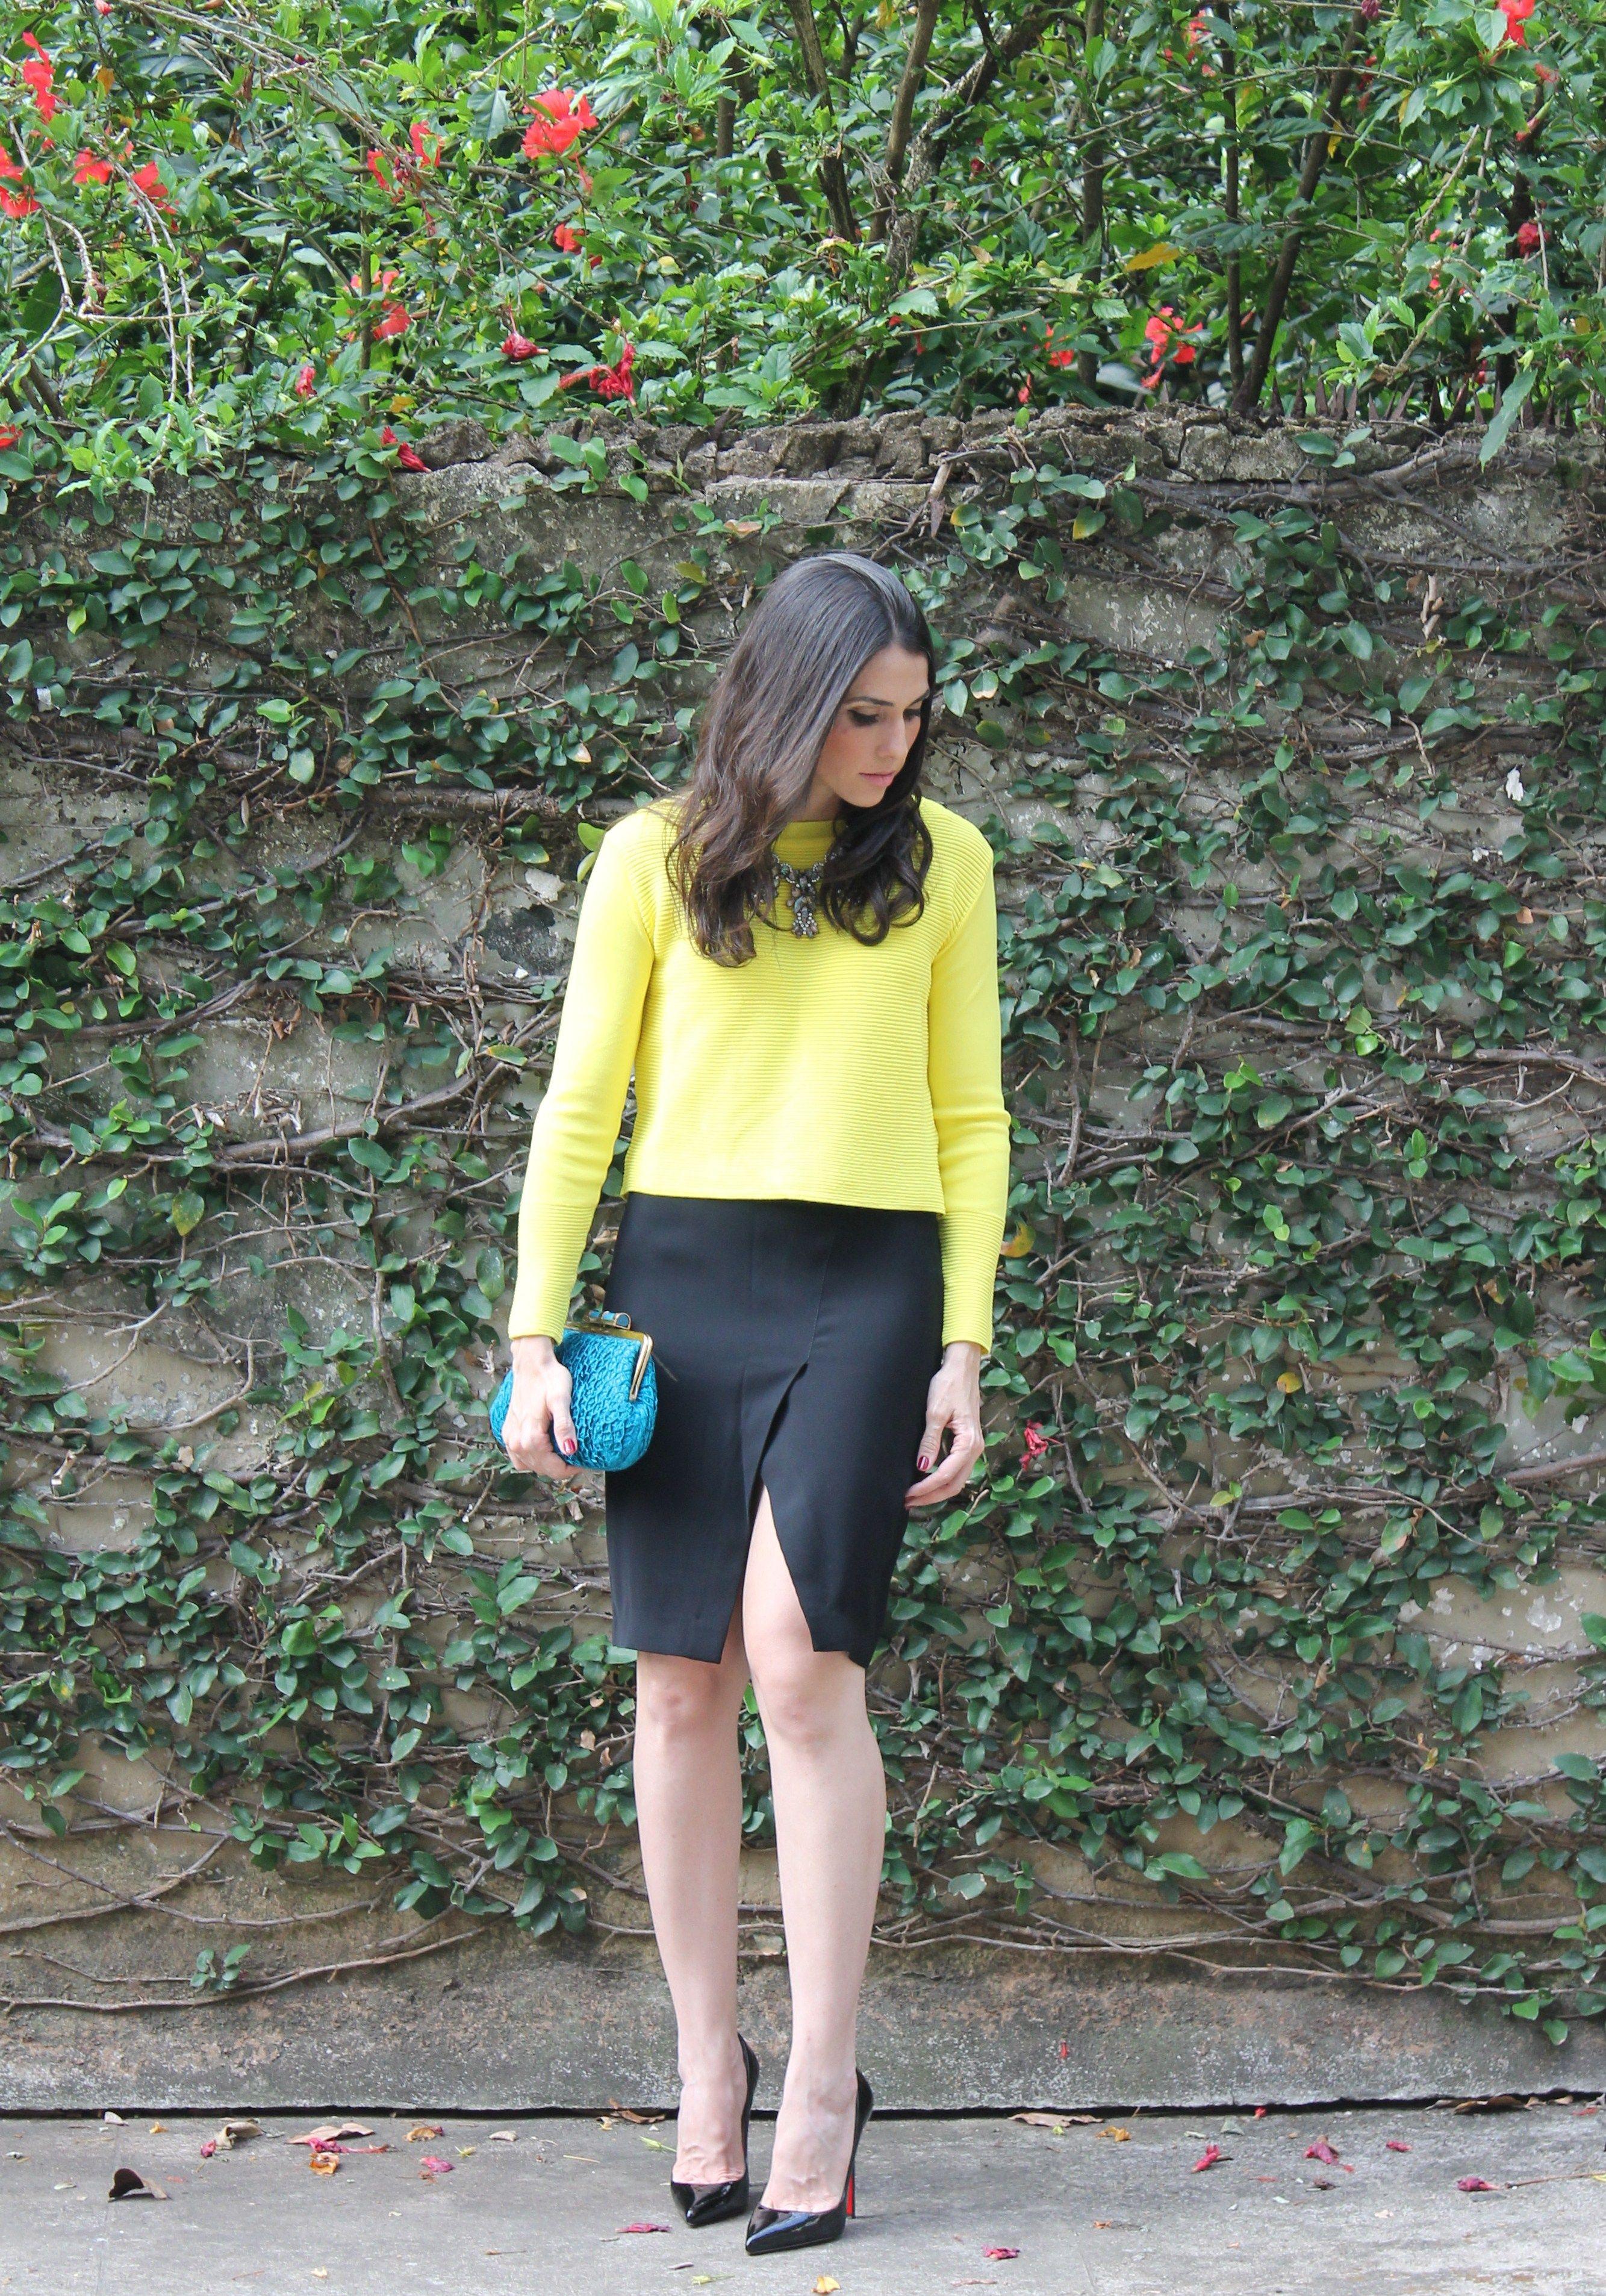 Blog Caca Dorceles. 2014. Meu Look: Verde e azul. Zara Cashmere + Zara pencil skirt + Christian Louboutin scarpin + Zara necklace  + Laura Lima clutch.